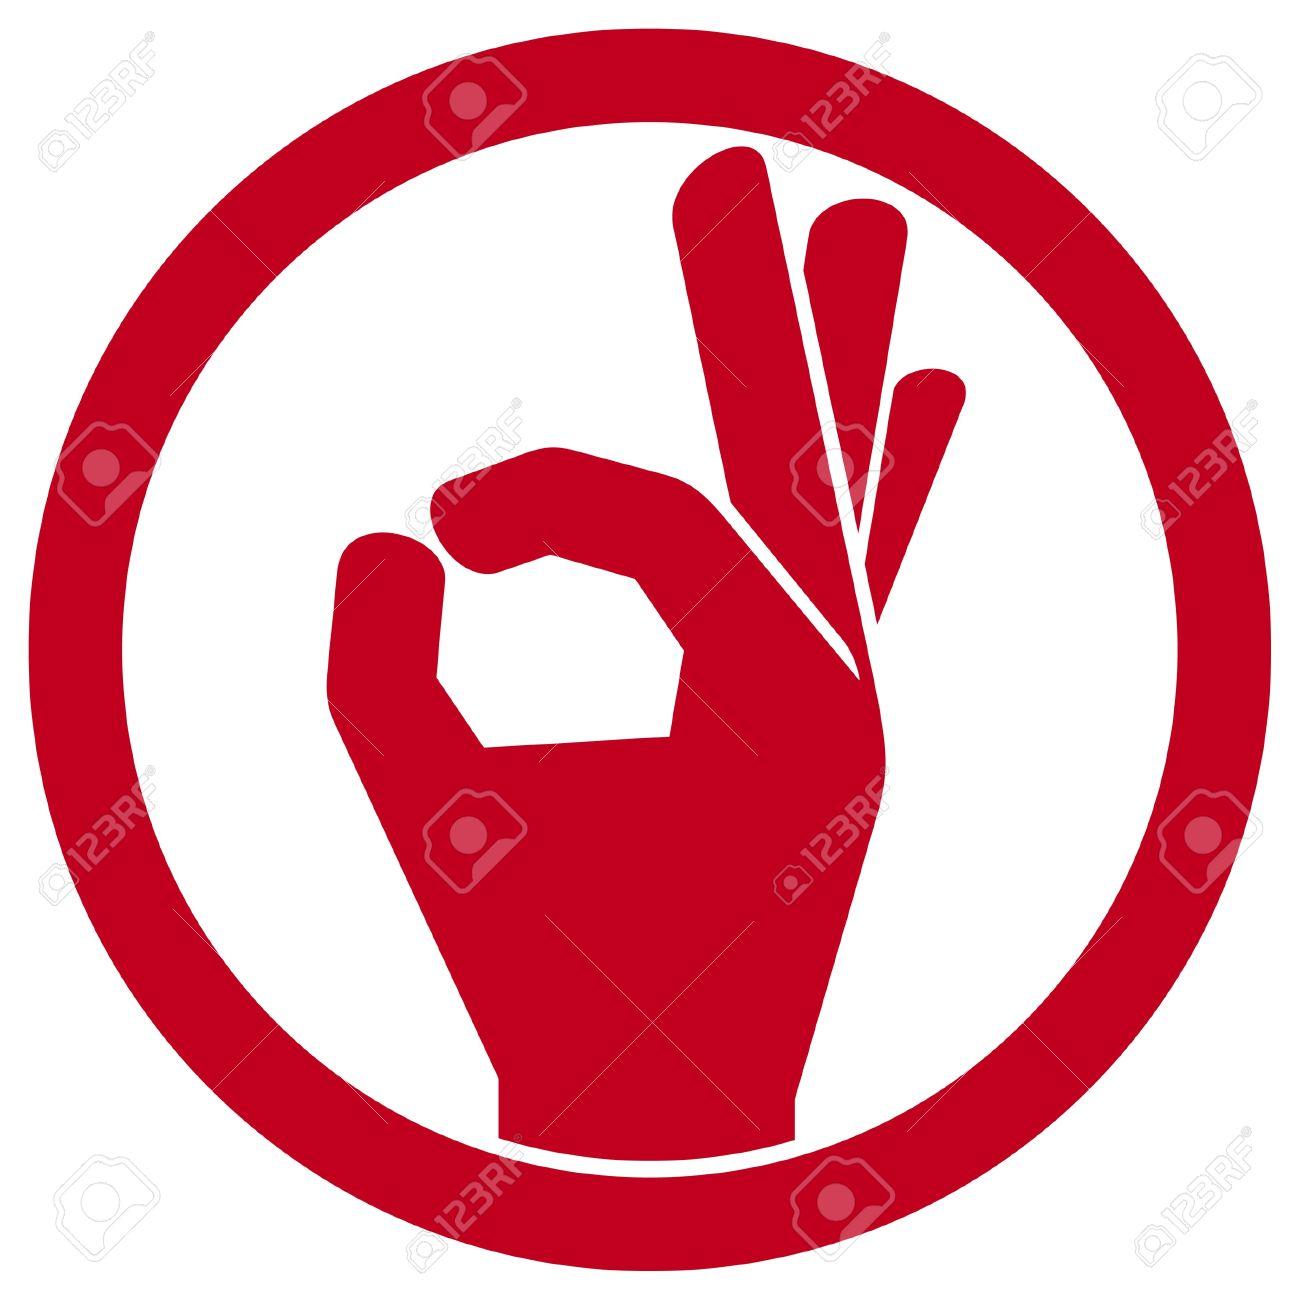 human okay hand sign (OK hand symbol, OK symbol, OK sign icon, hand okay sign, man hand showing ok sign) Stock Vector - 16675309